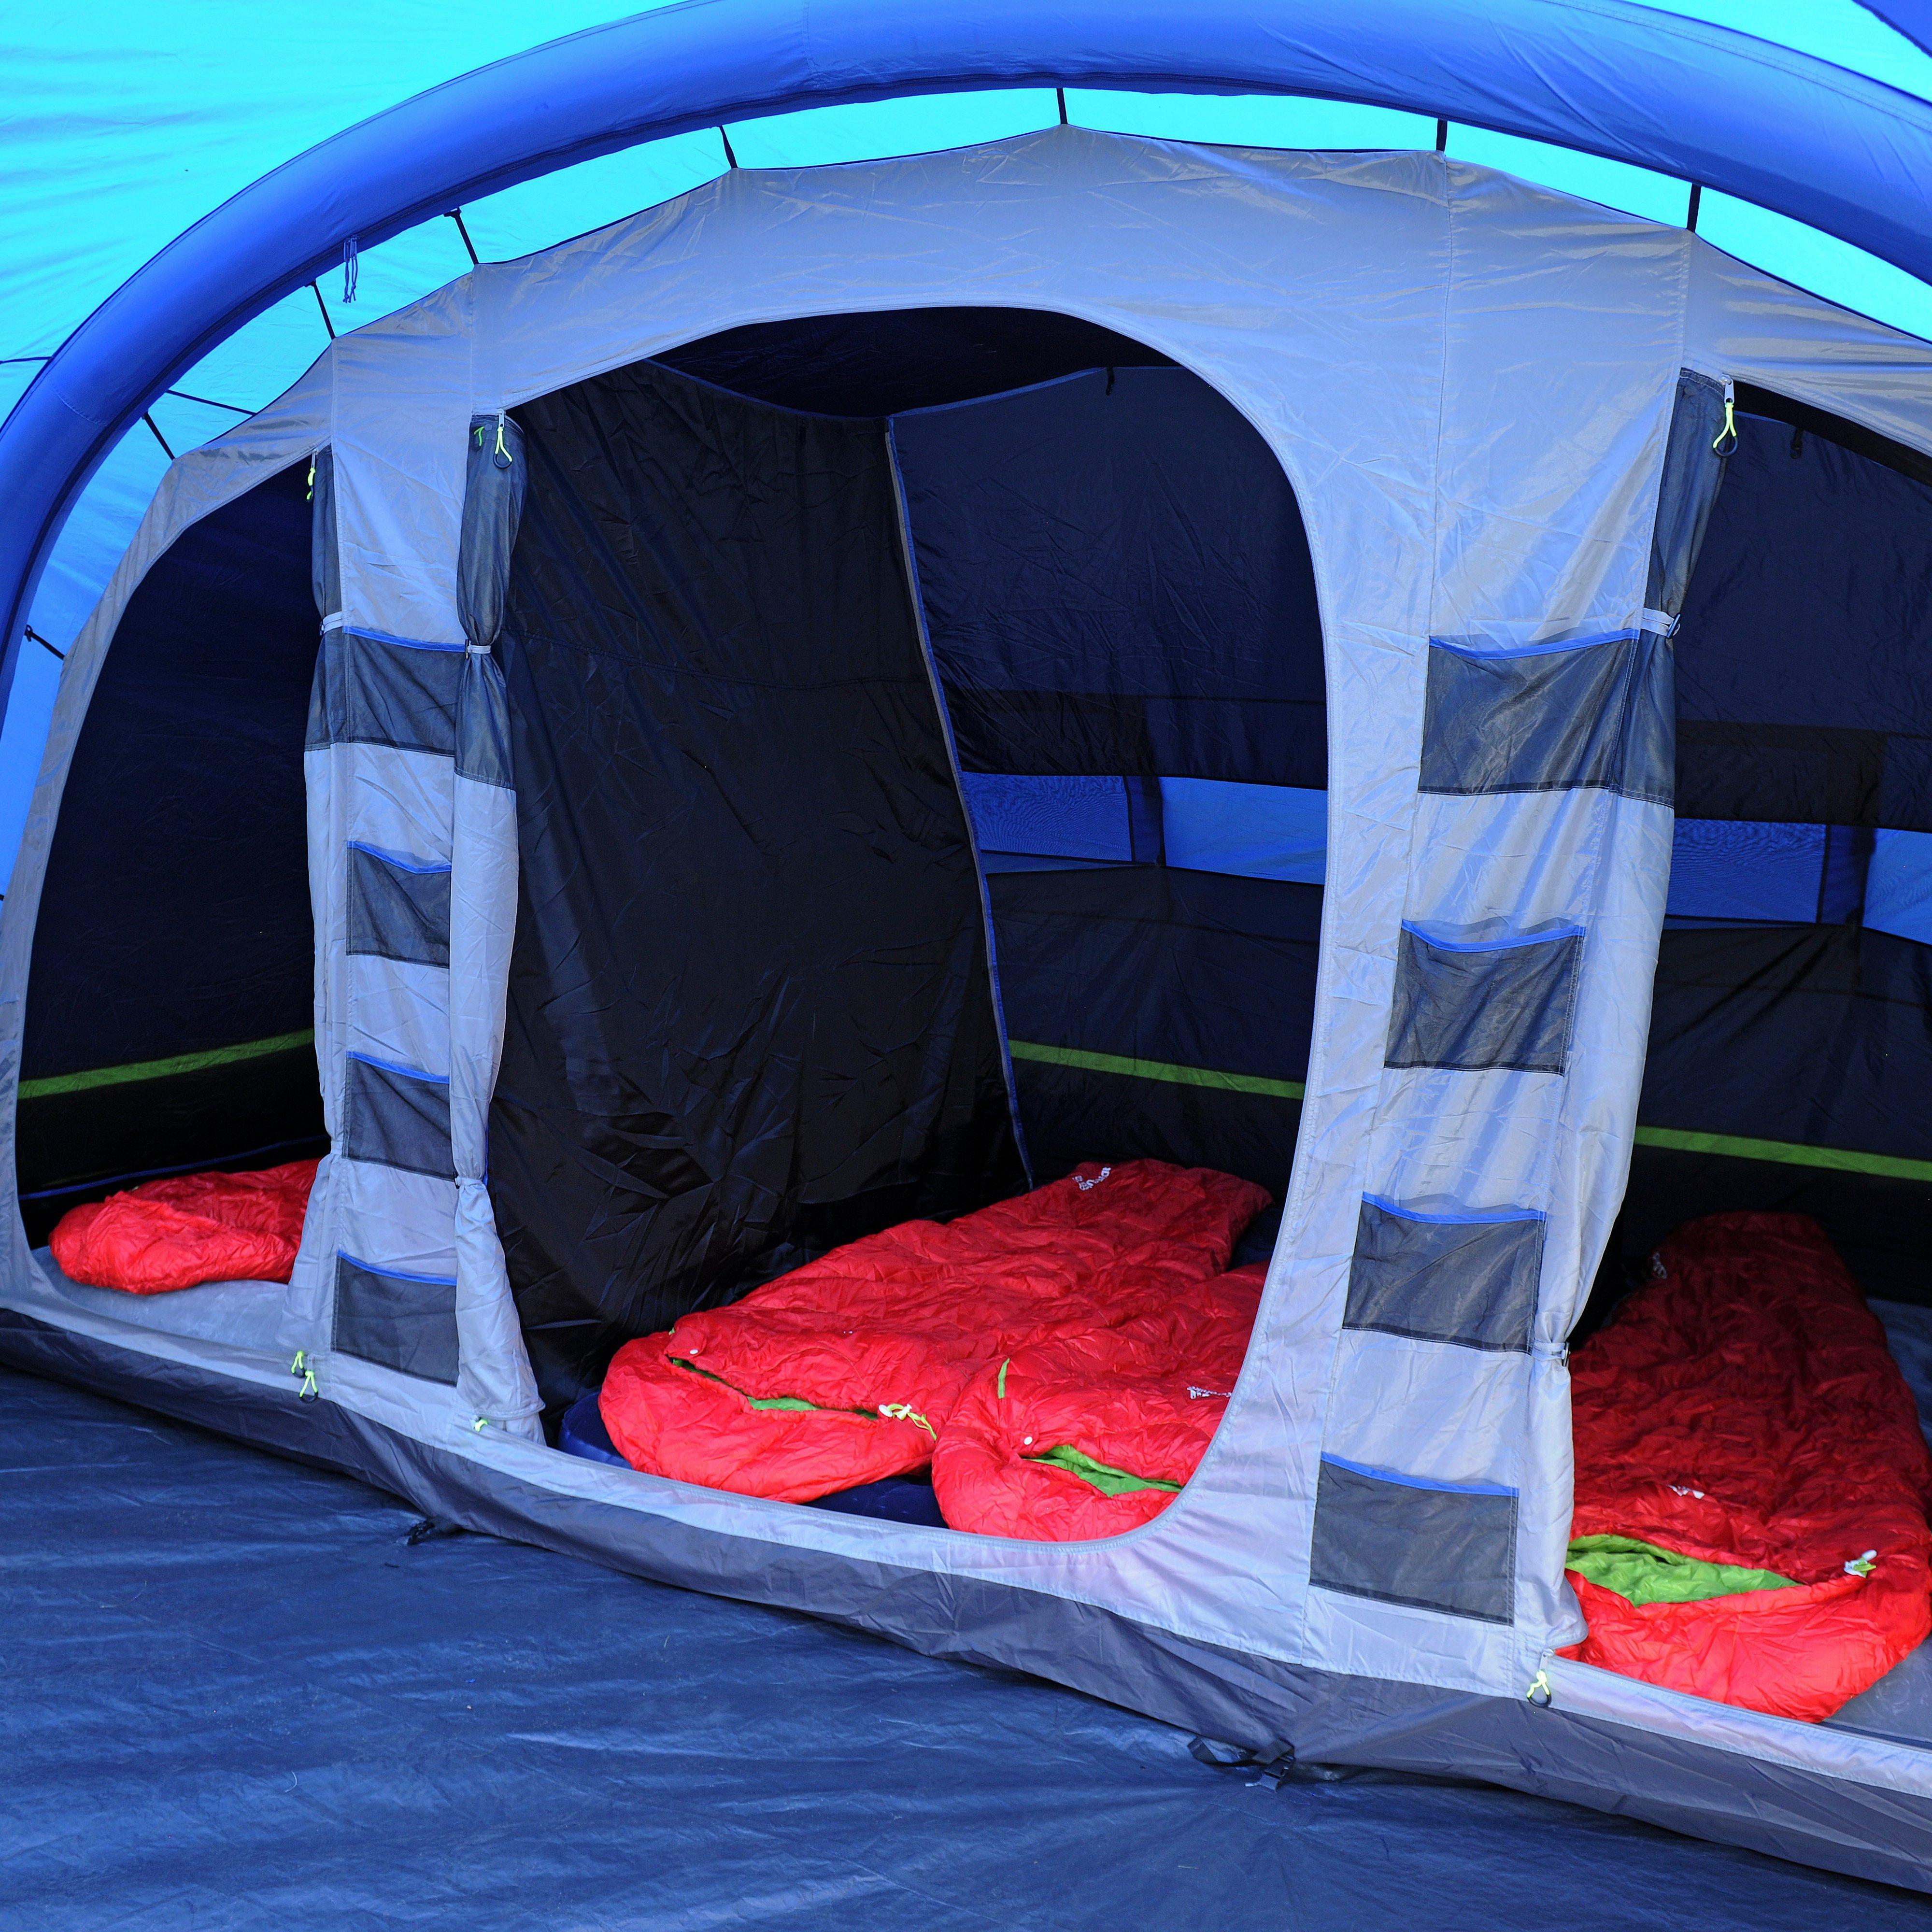 Berghaus Air 6 XL Air Tent & Berghaus Air 6 XL Air Tent | Millet Sports